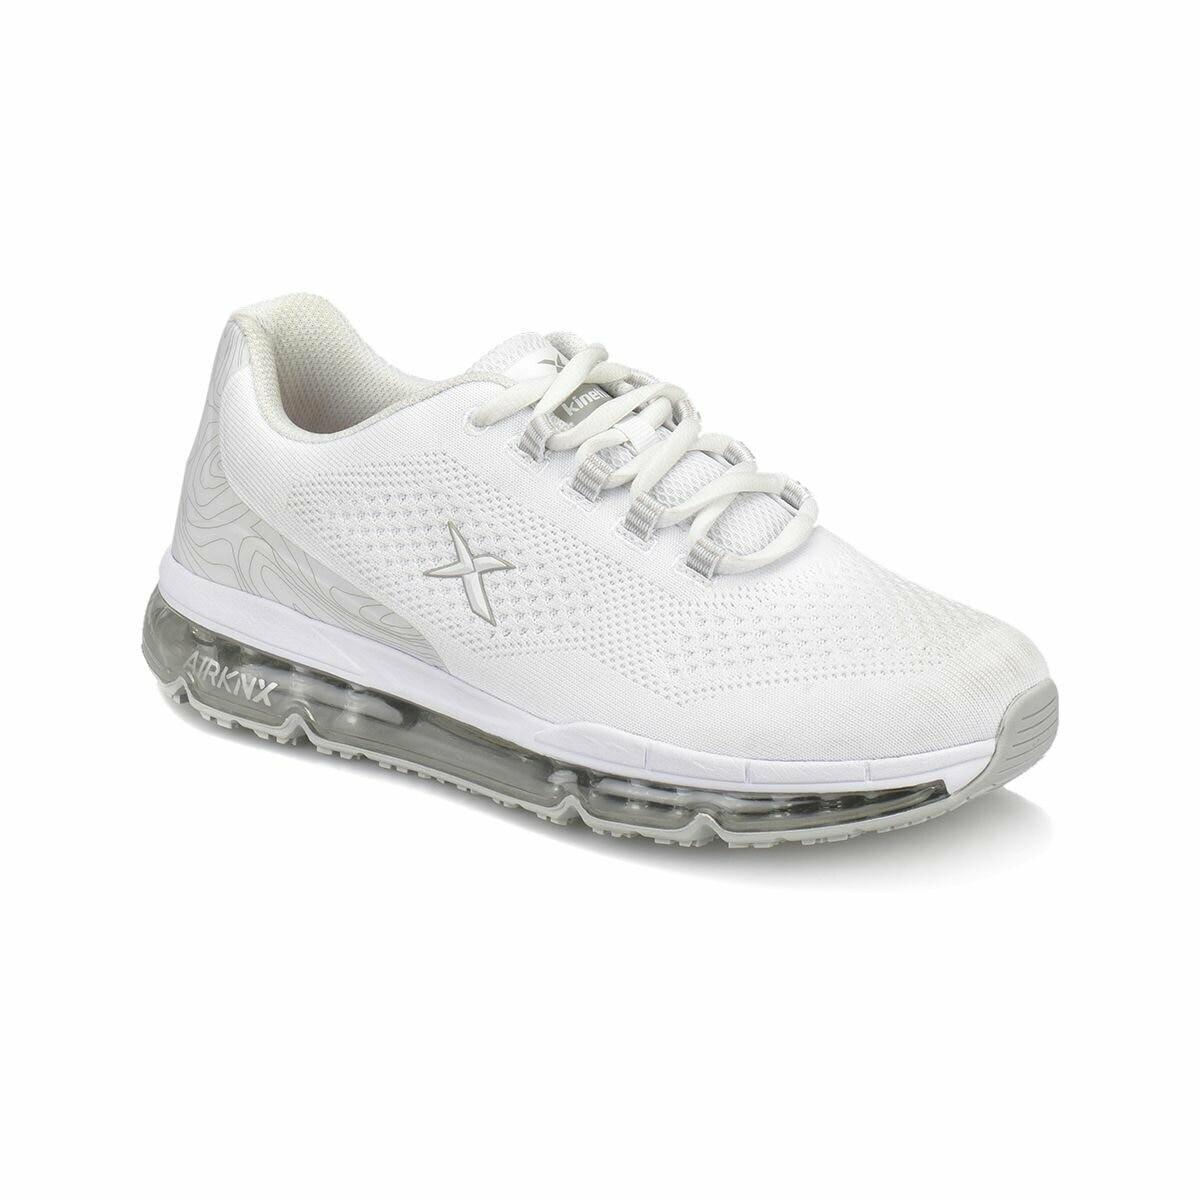 FLO SILVANA White Men 'S Sneaker Shoes KINETIX